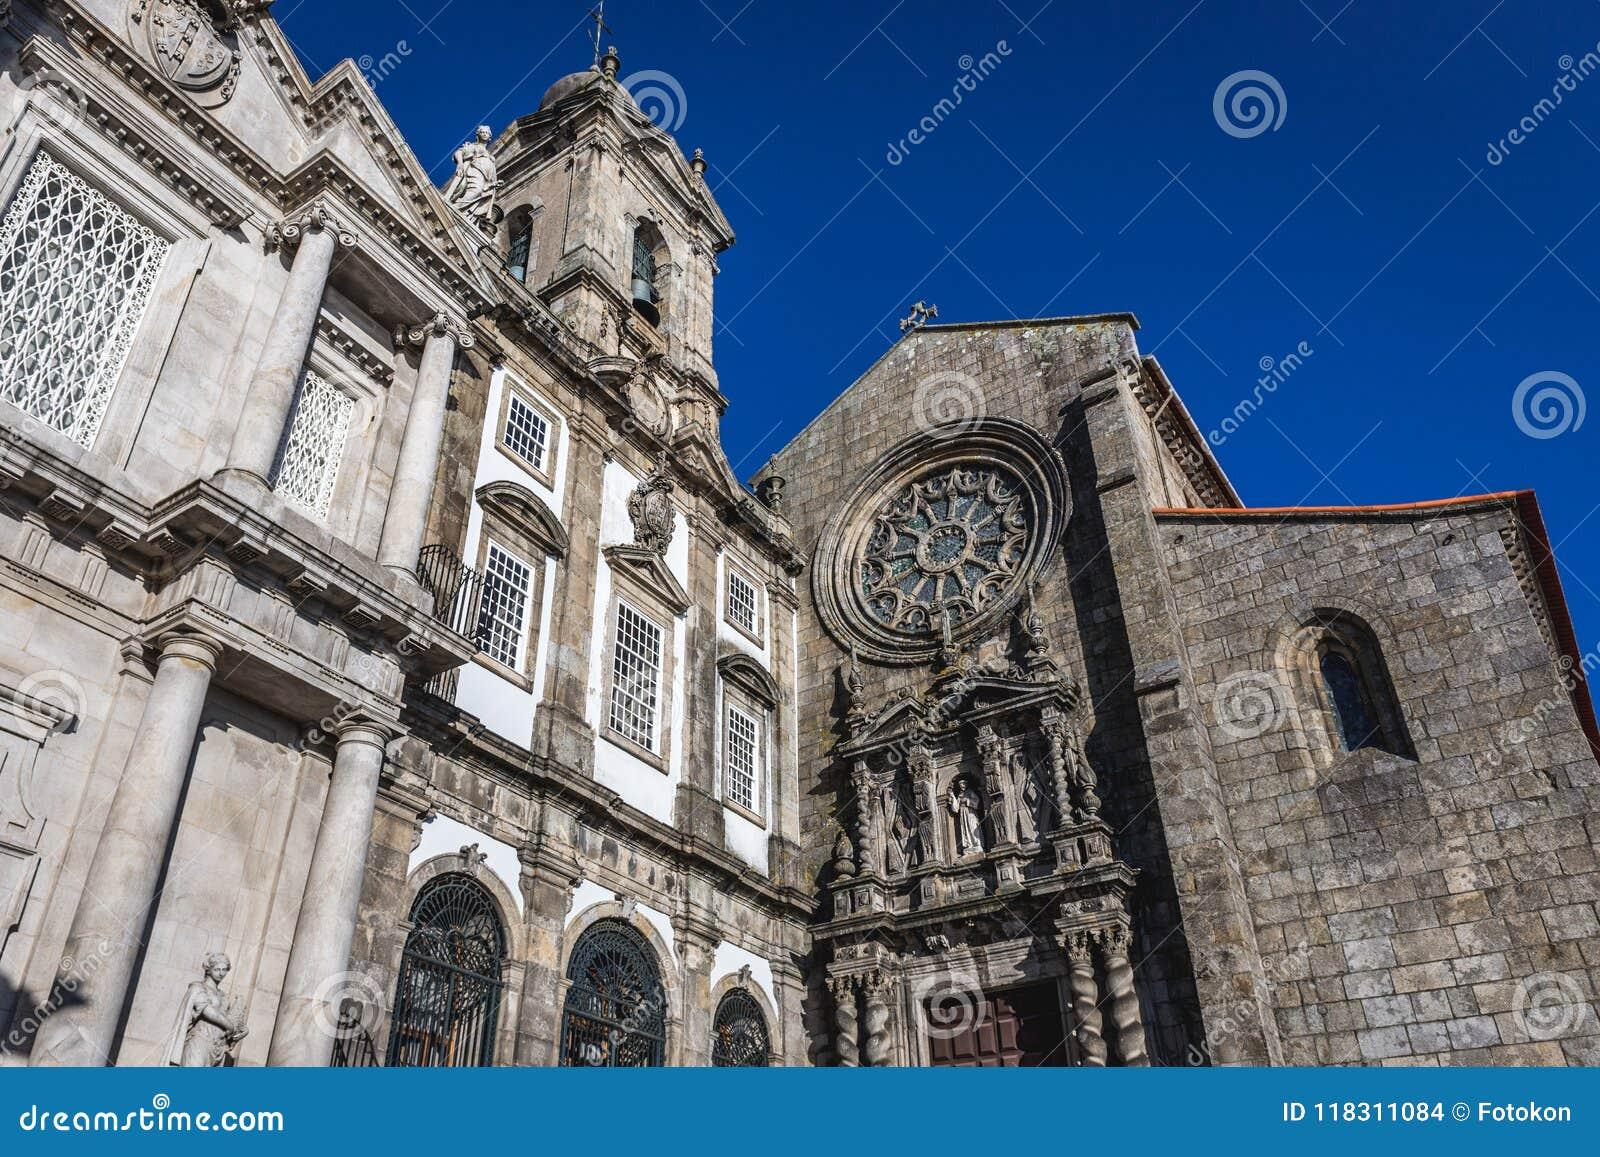 Igrejas em Porto